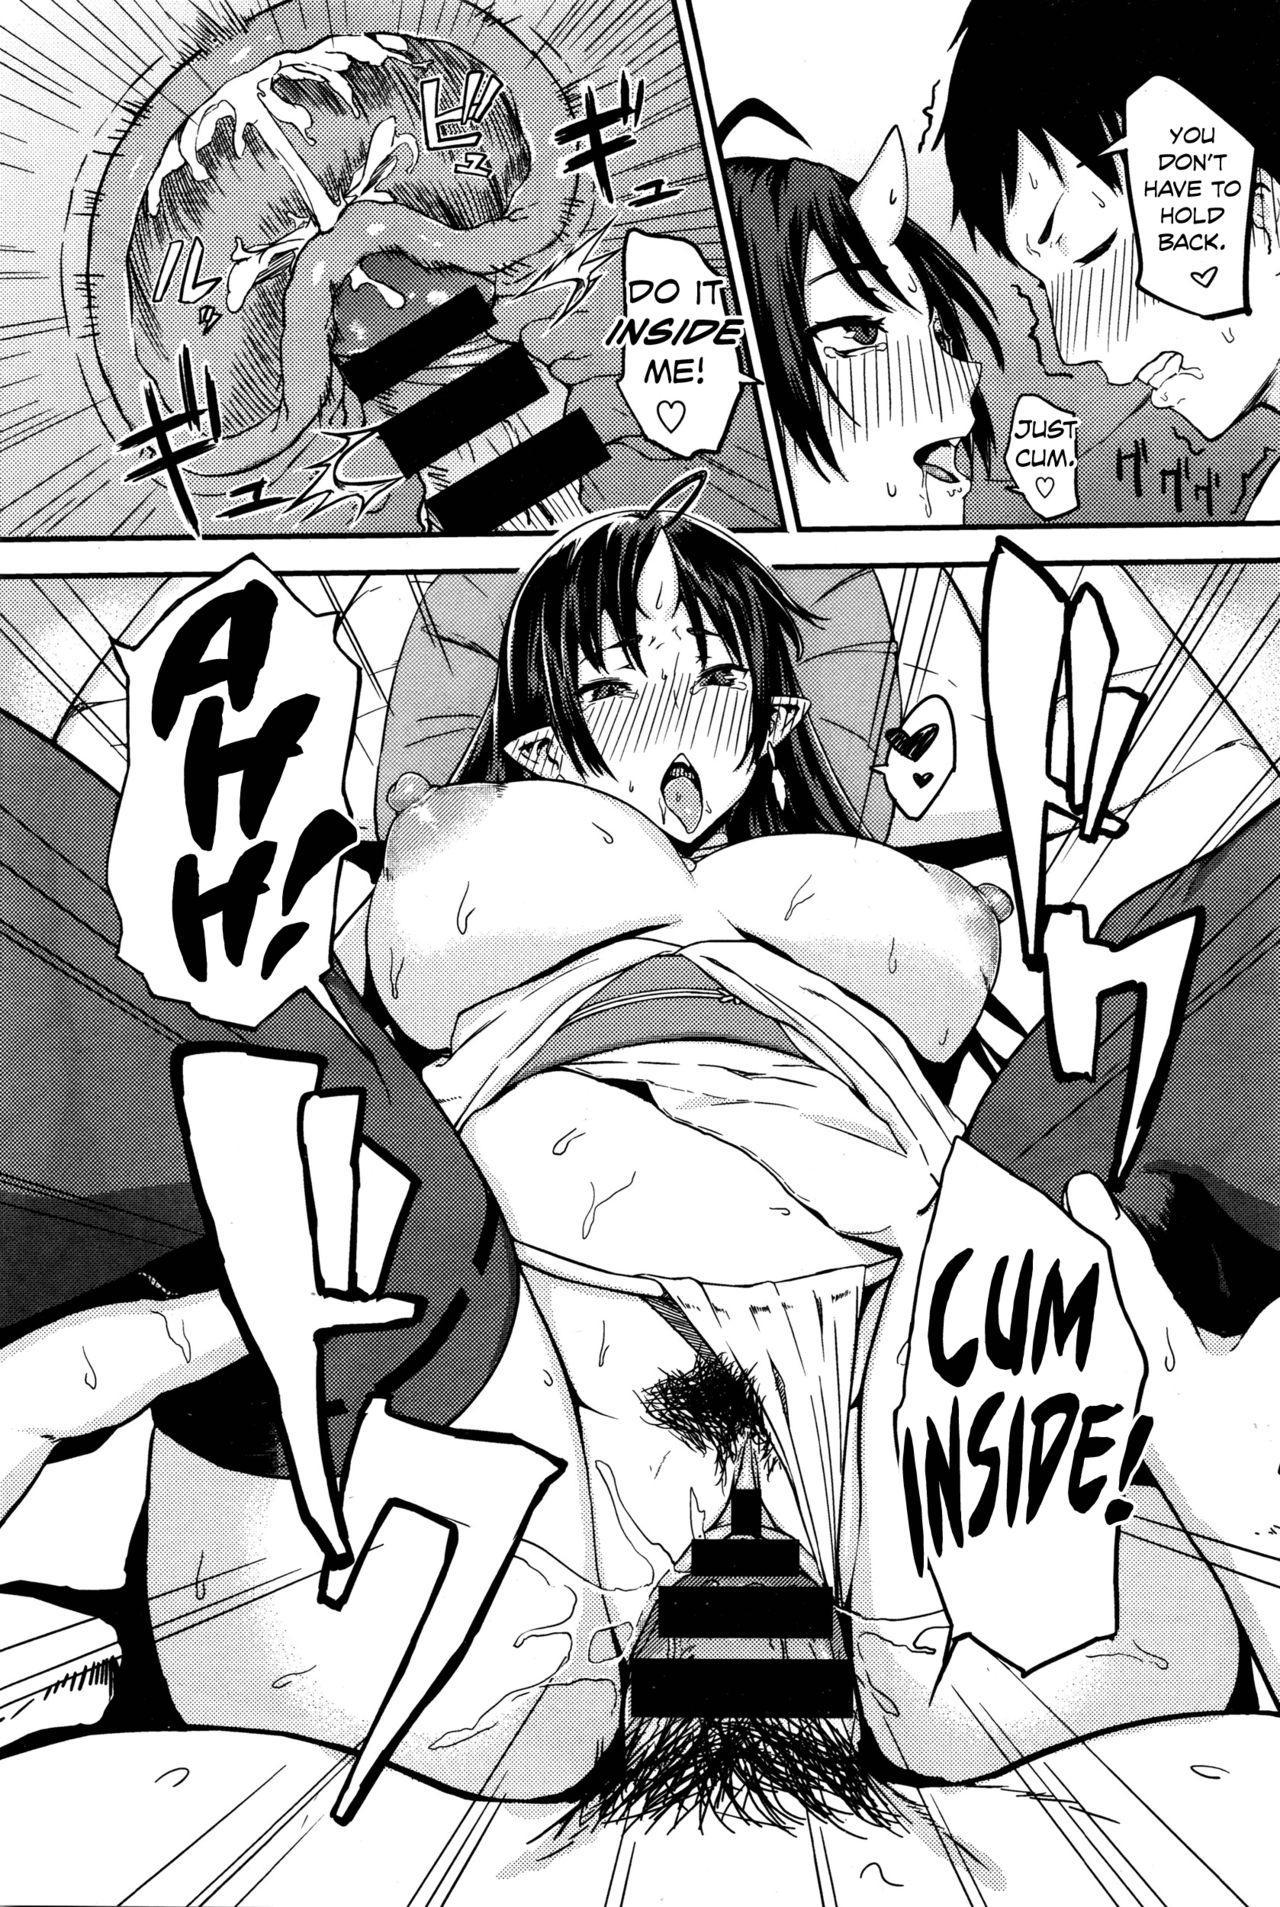 [obmas] Onegai! Onigami-sama♥ - Please! Fearful God♥ [COMIC BAVEL 2016-01] [English] [Noraneko] 14